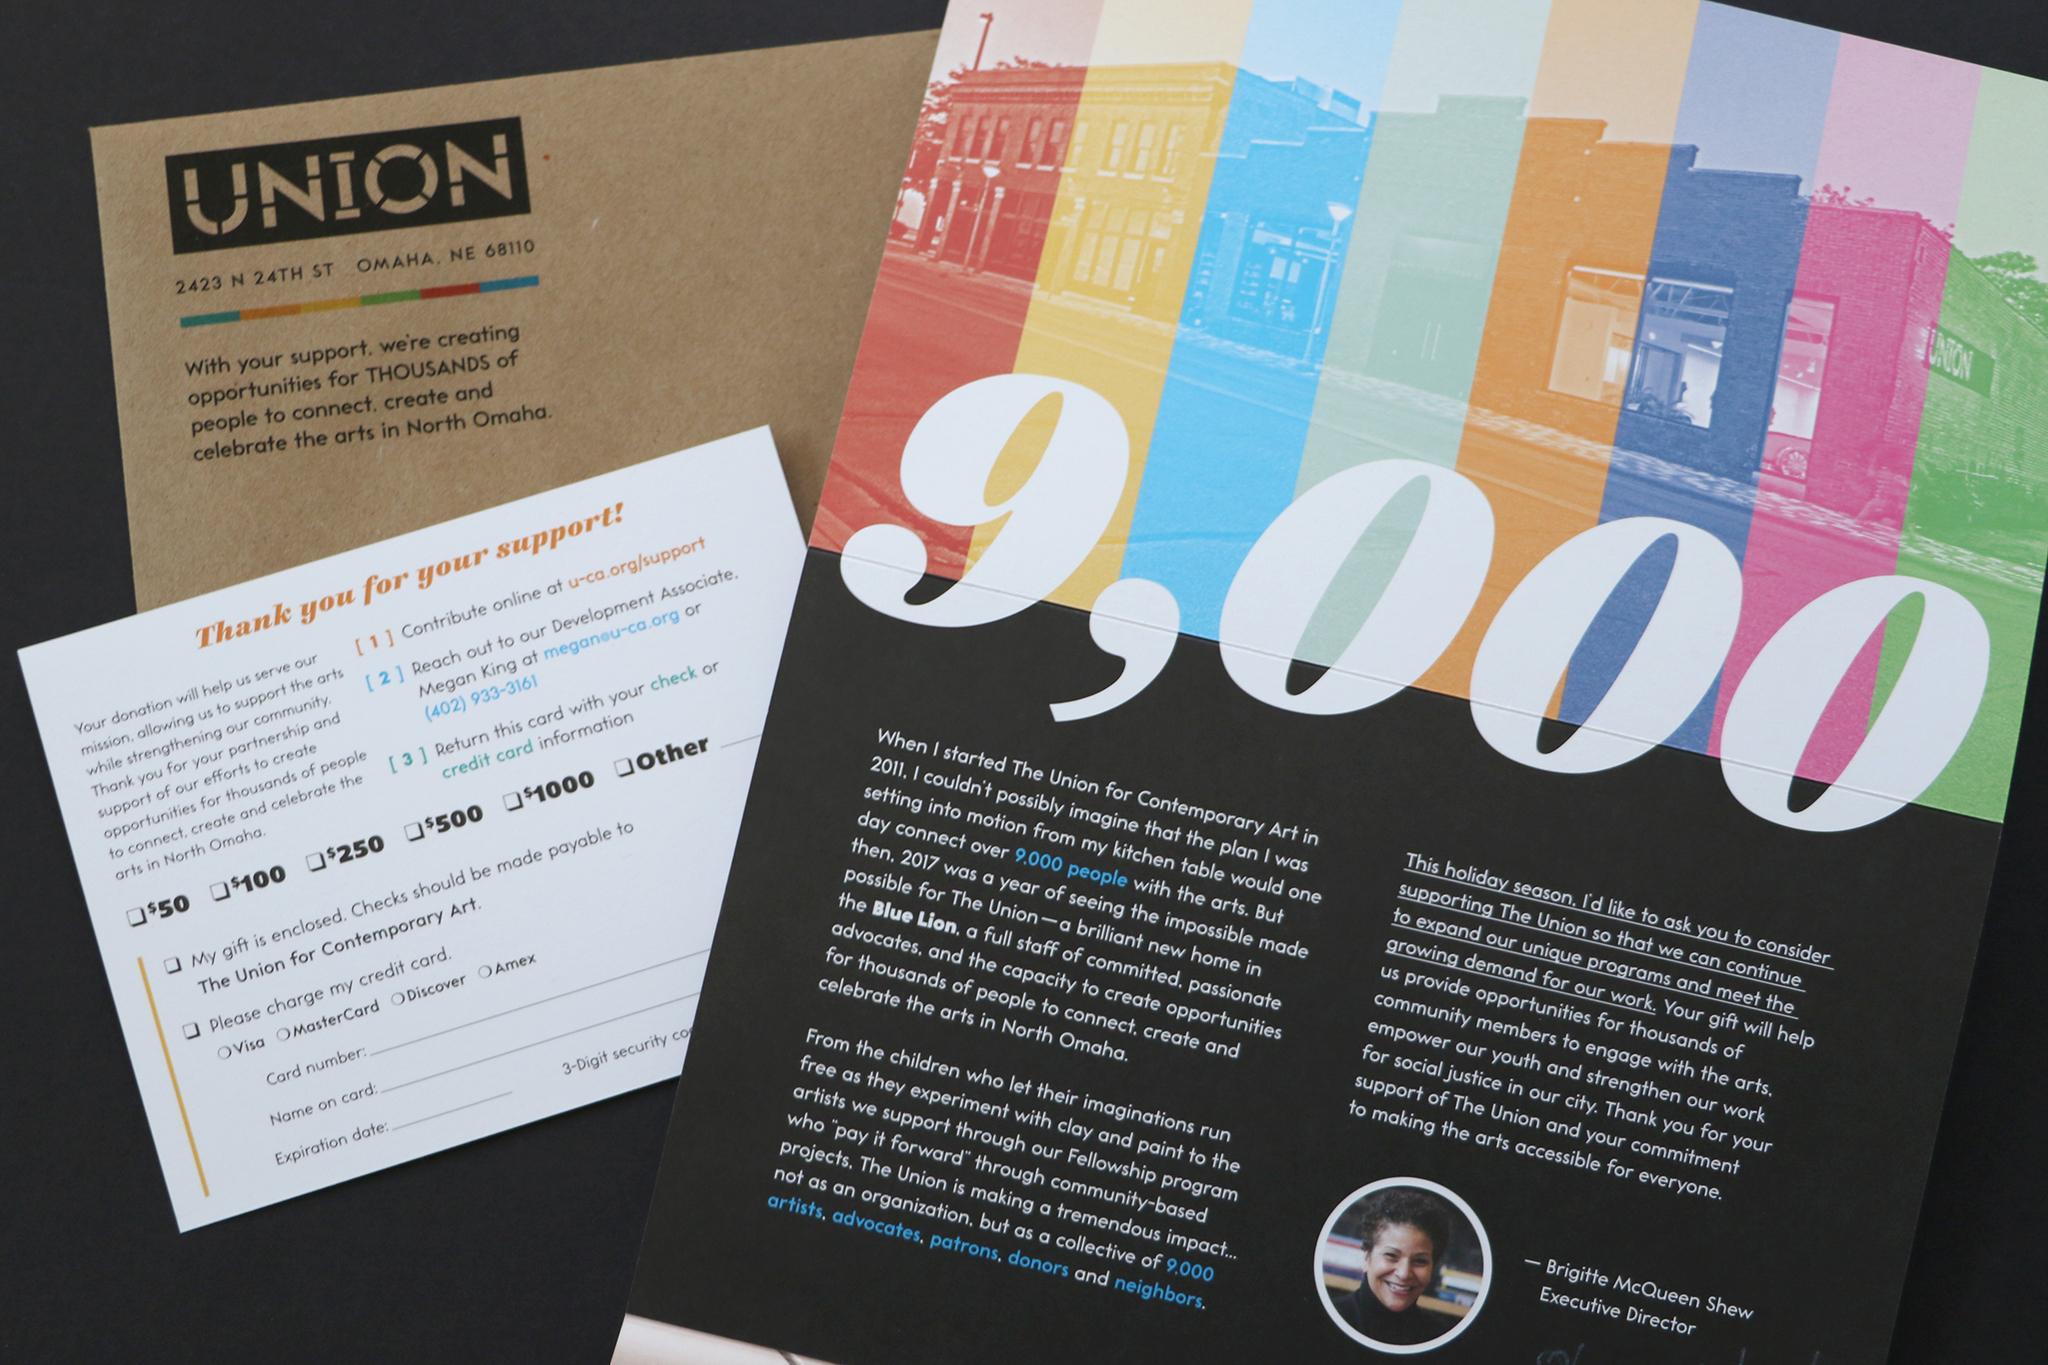 jkdc_union-9000-1.jpg